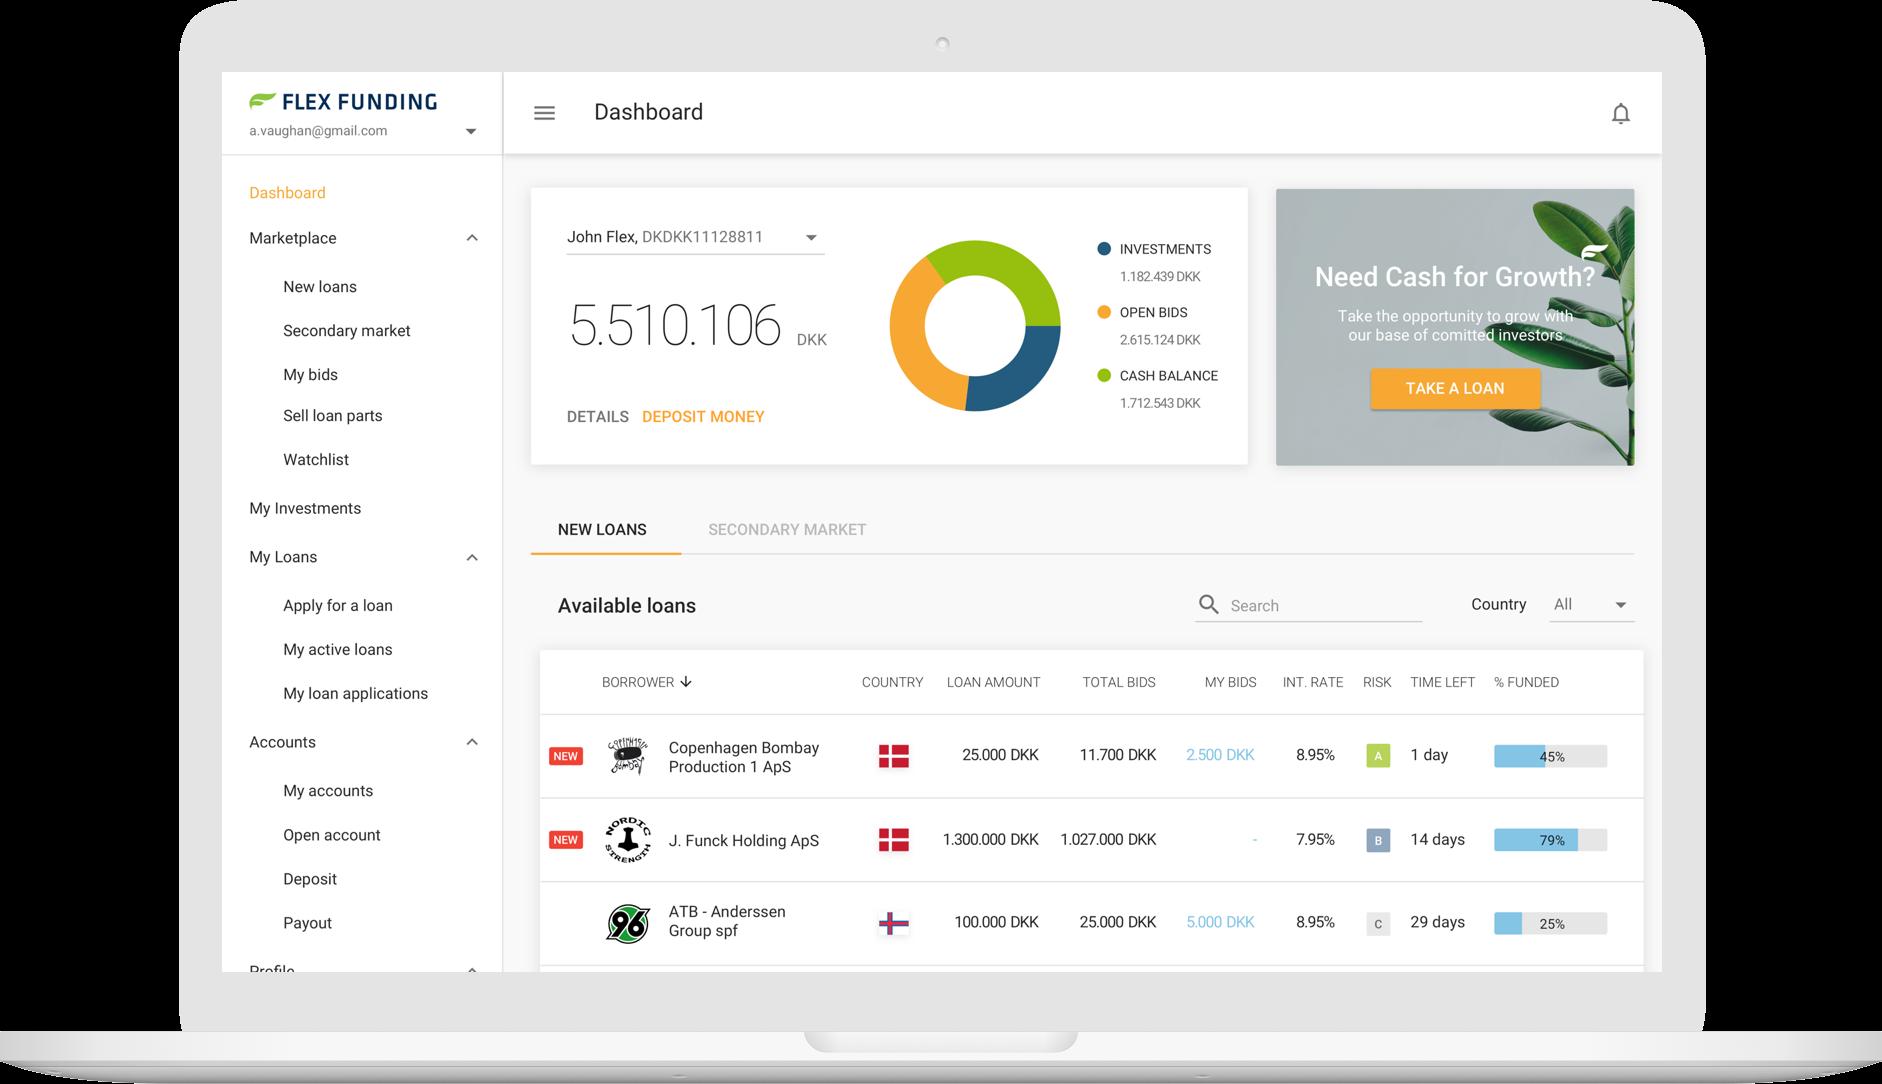 Flex Funding user dashboard